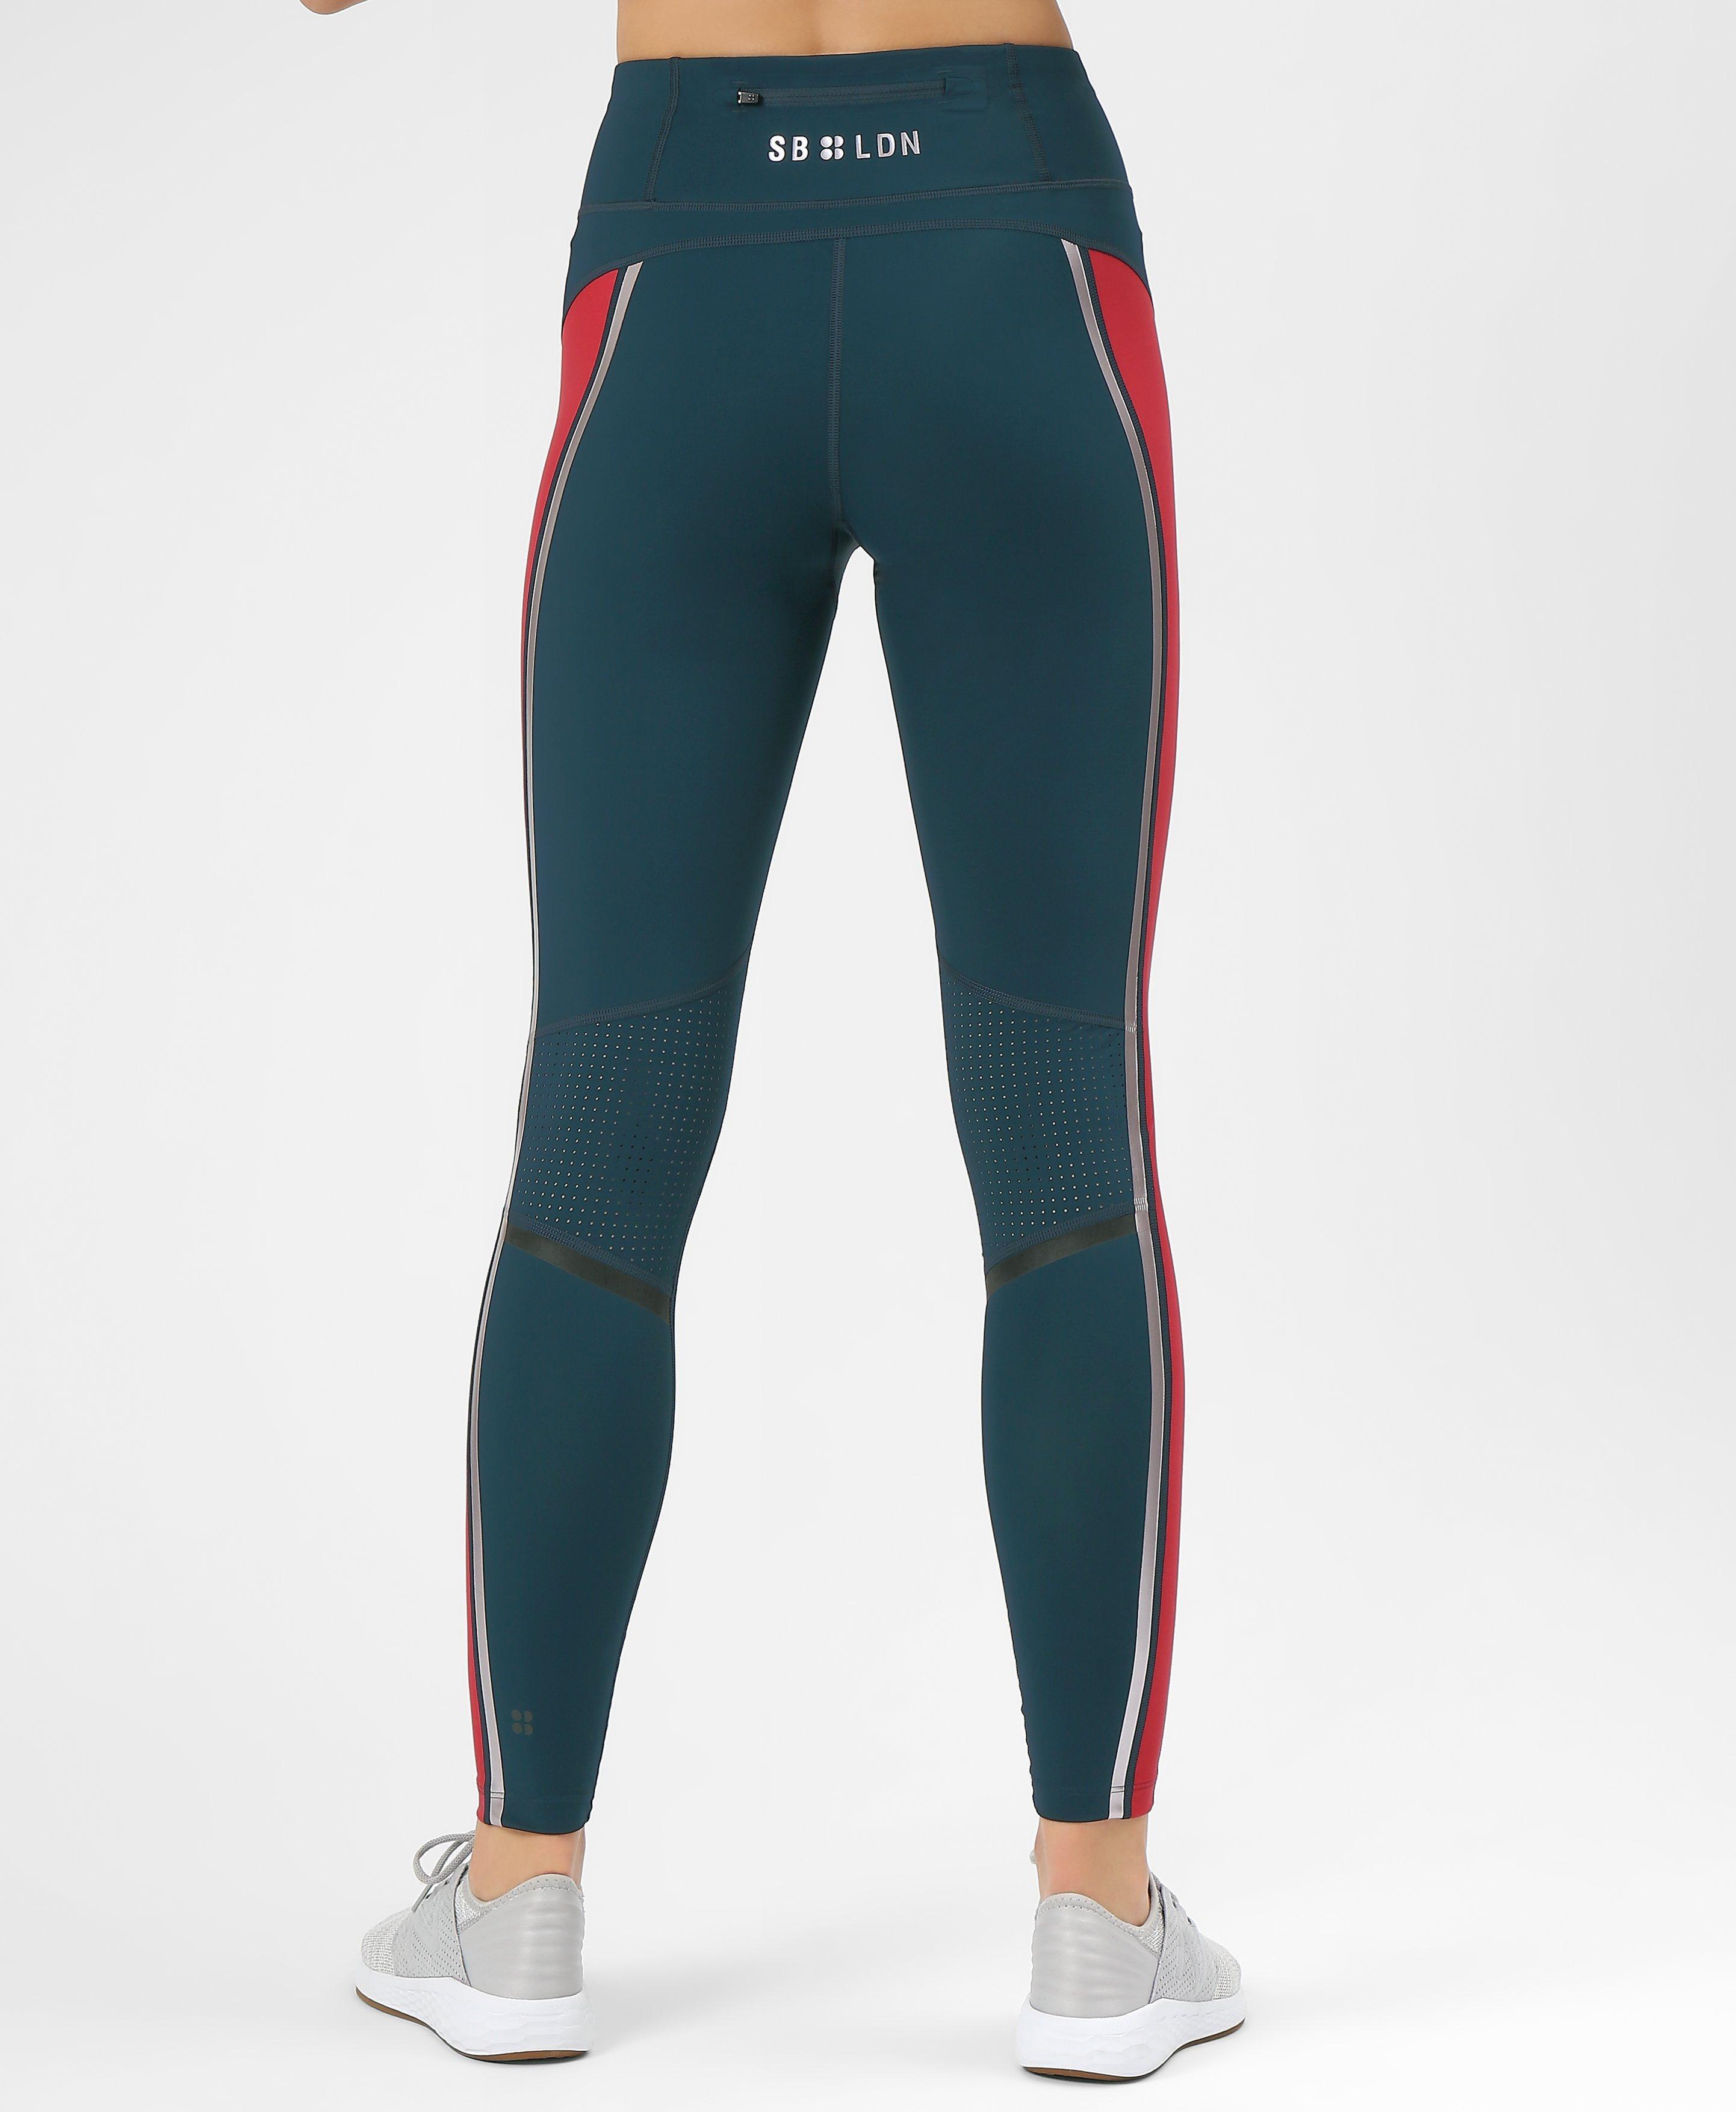 zero gravity run leggings